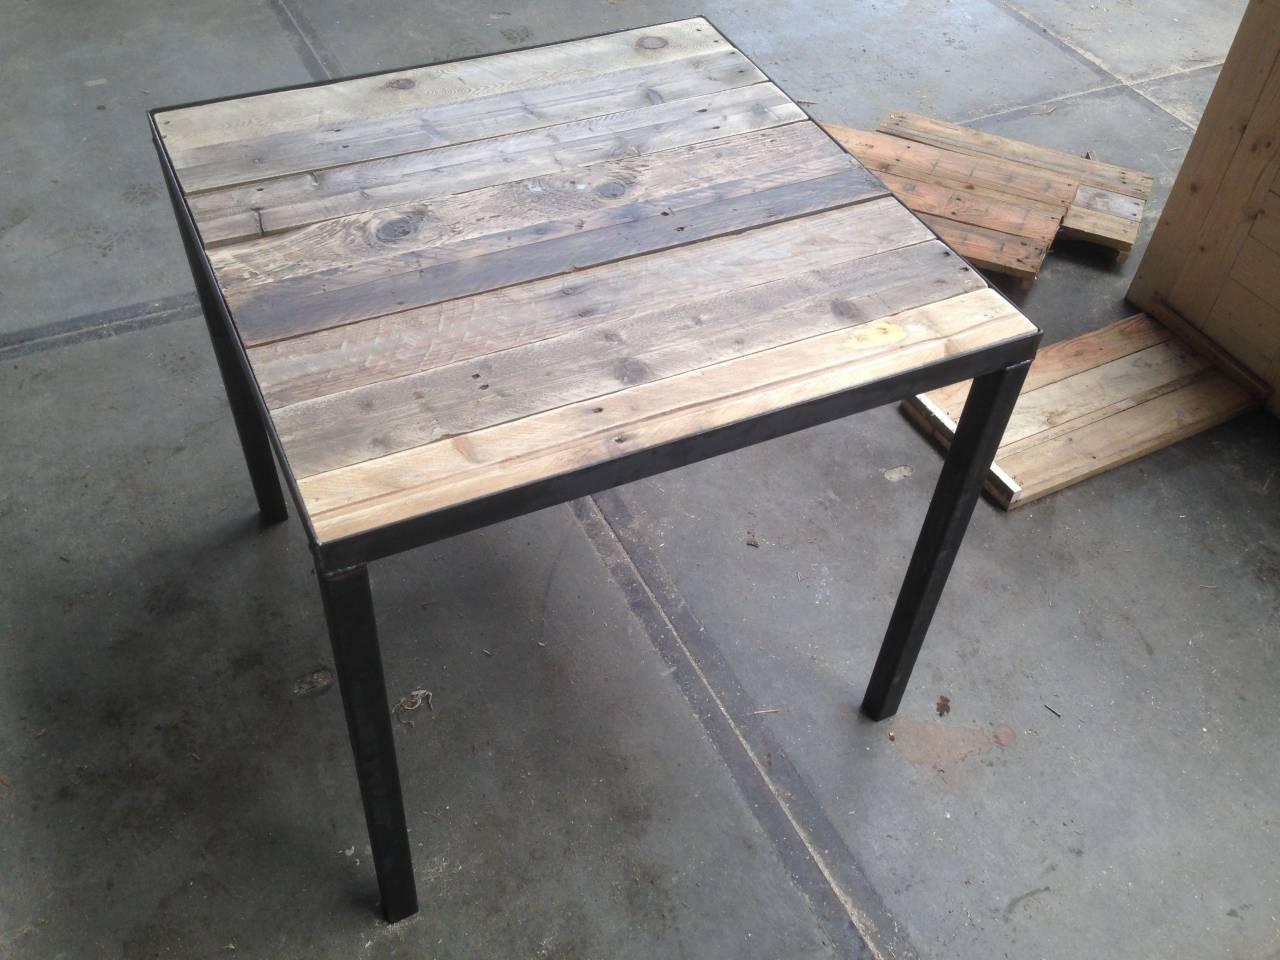 Stalen Onderstel Tafel : Horeca tafel met sloophout blad en stalen frame en onderstel